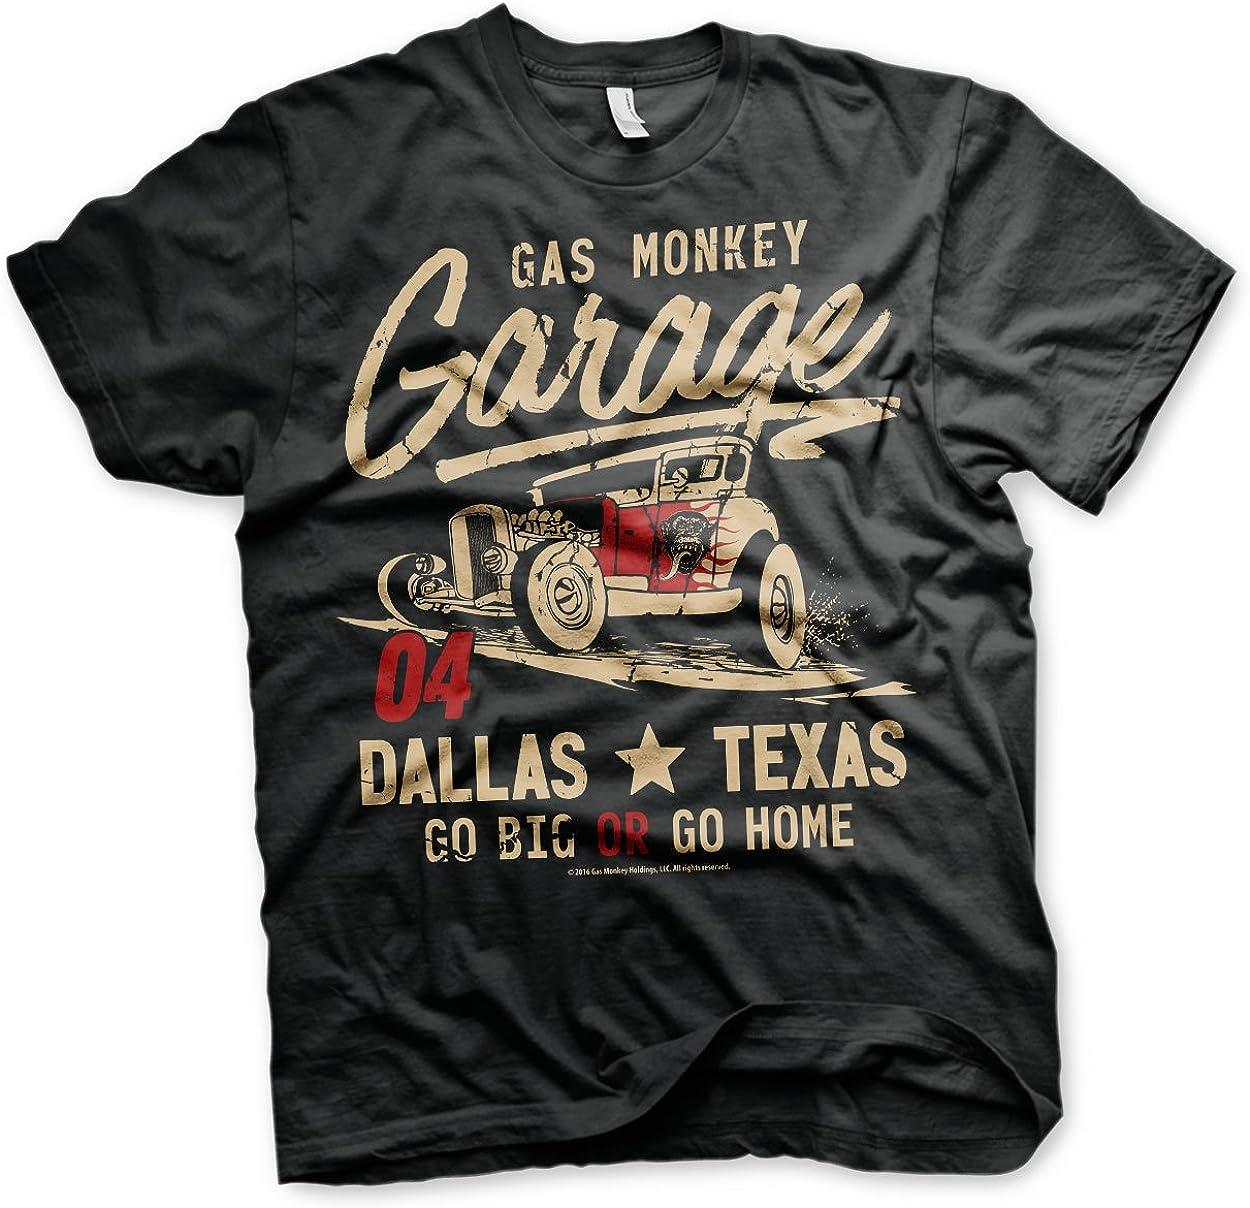 Gas Monkey Garage Officially Licensed GMG - Go Big Or Go Home 3XL,4XL,5XL Mens T-Shirt (Black)